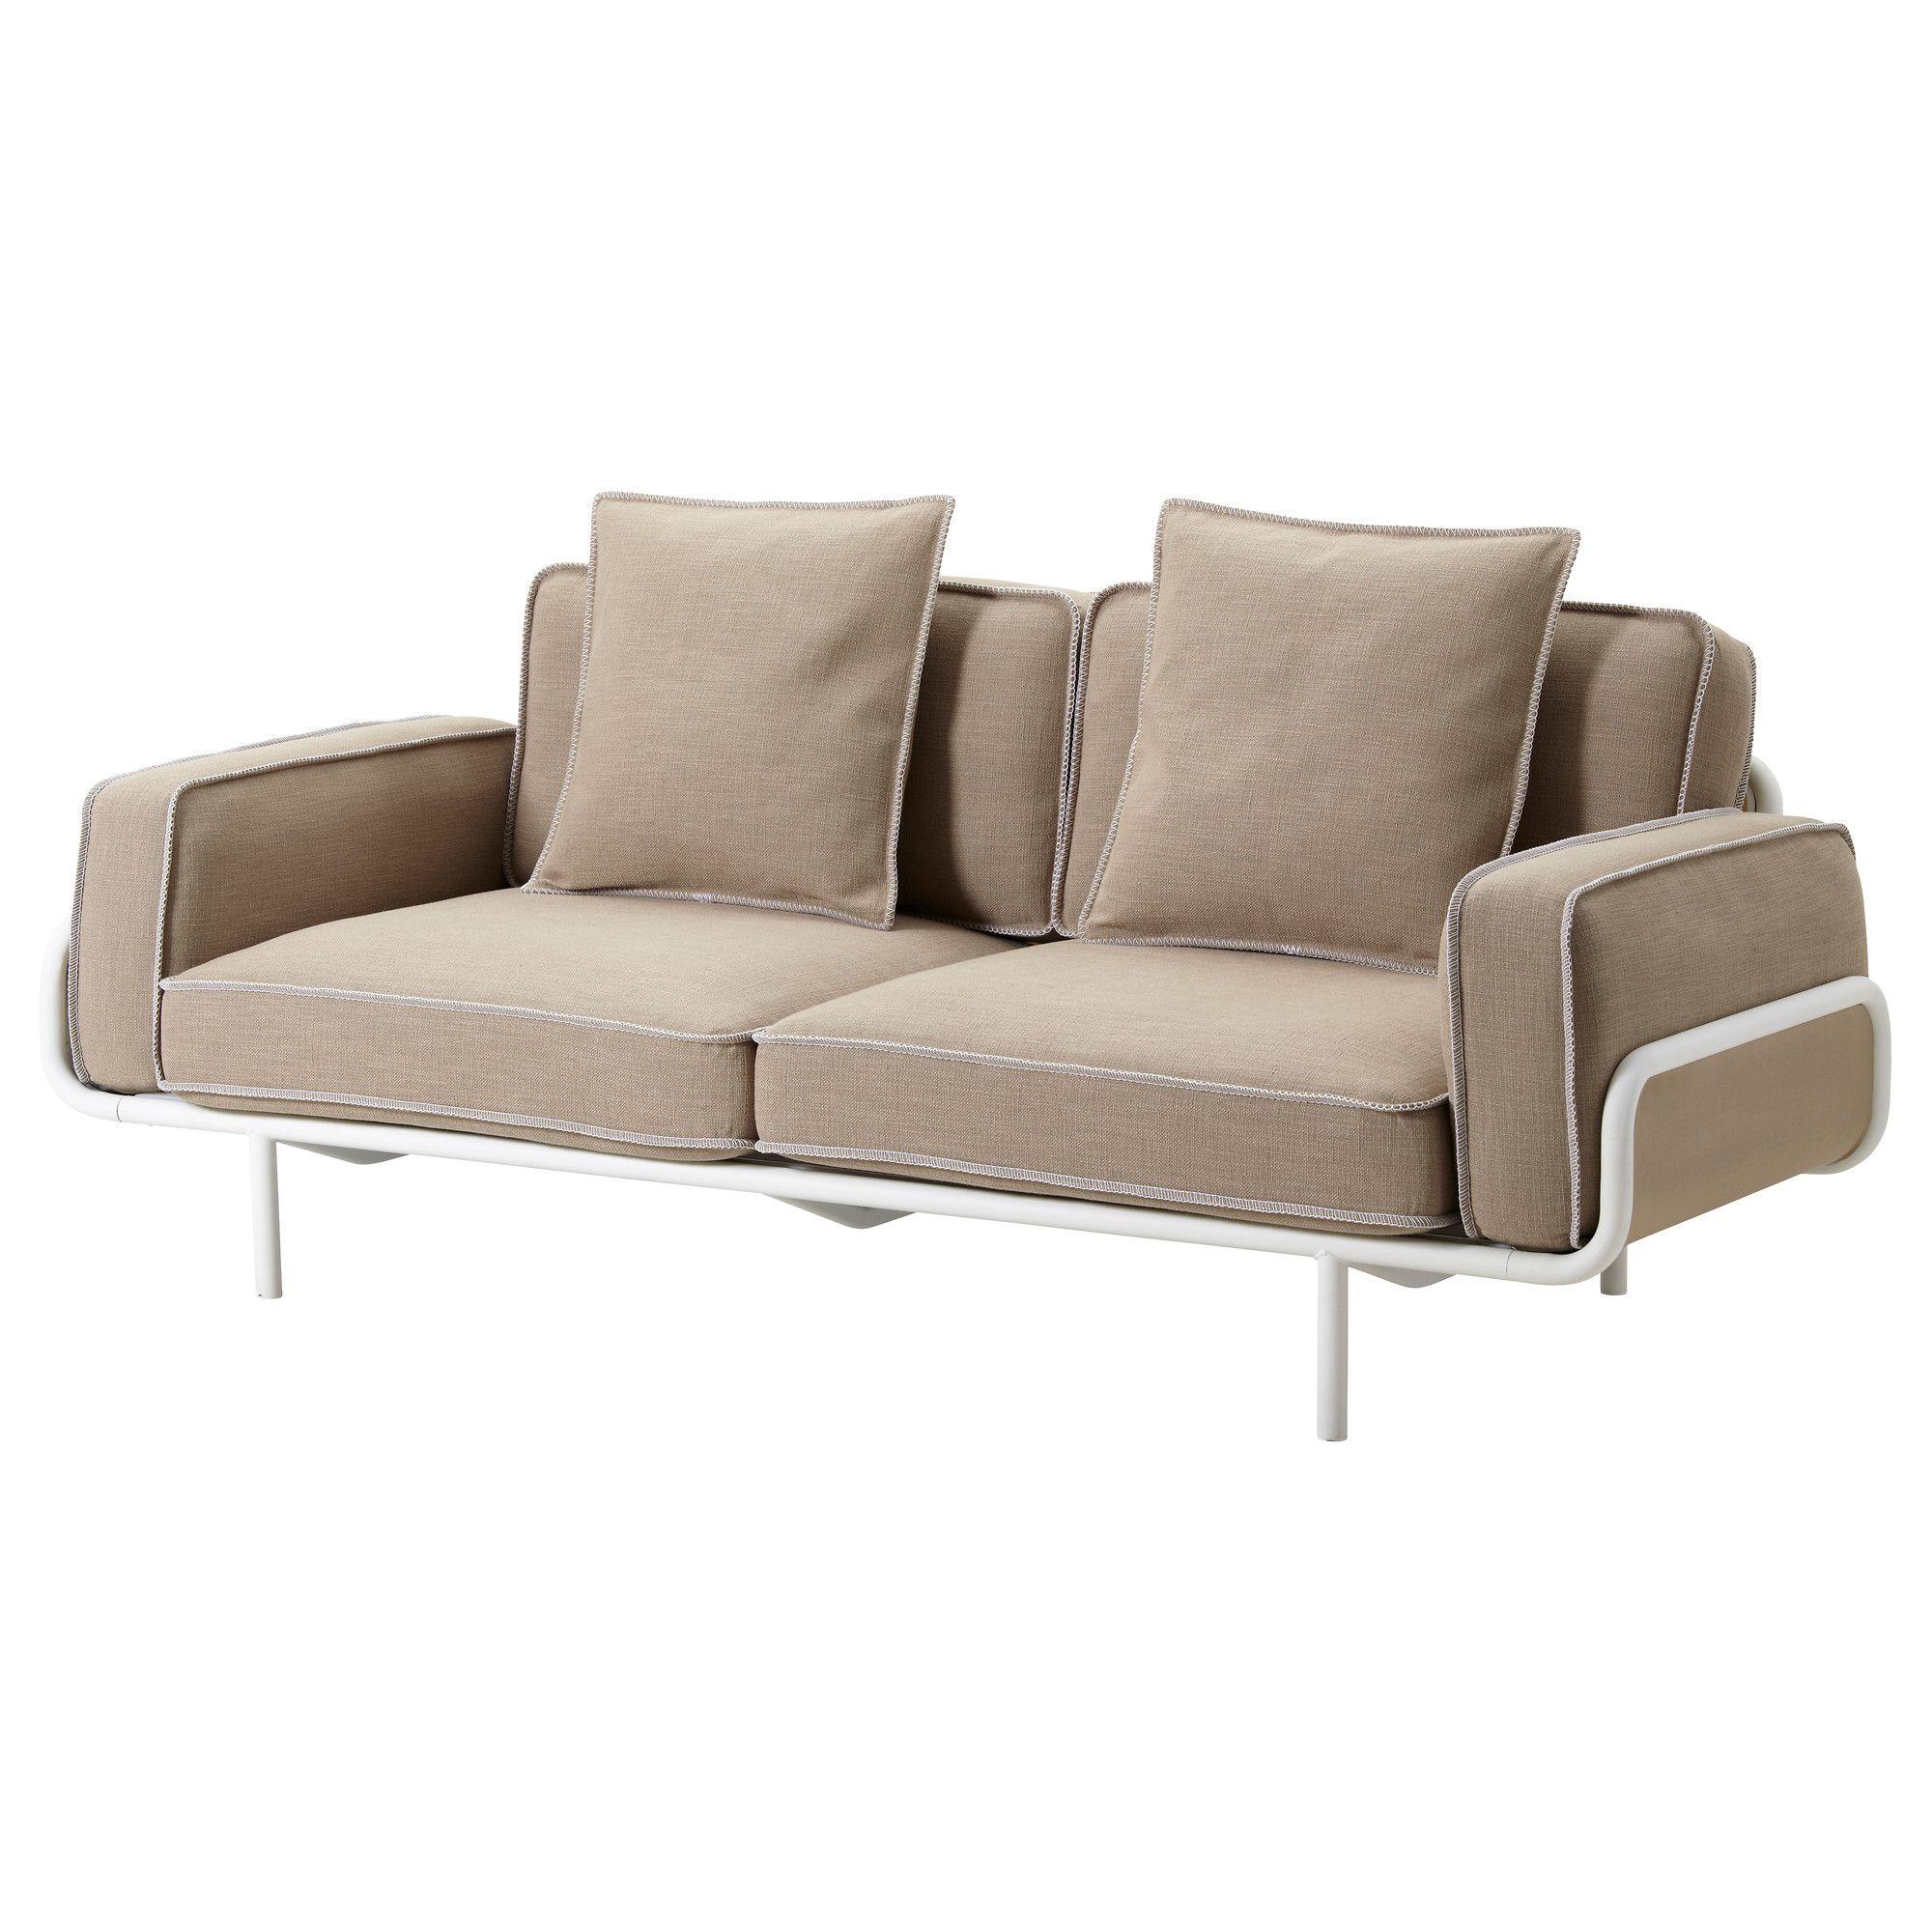 ikea ps 2012 sofa white lind beige ikea i am going to. Black Bedroom Furniture Sets. Home Design Ideas